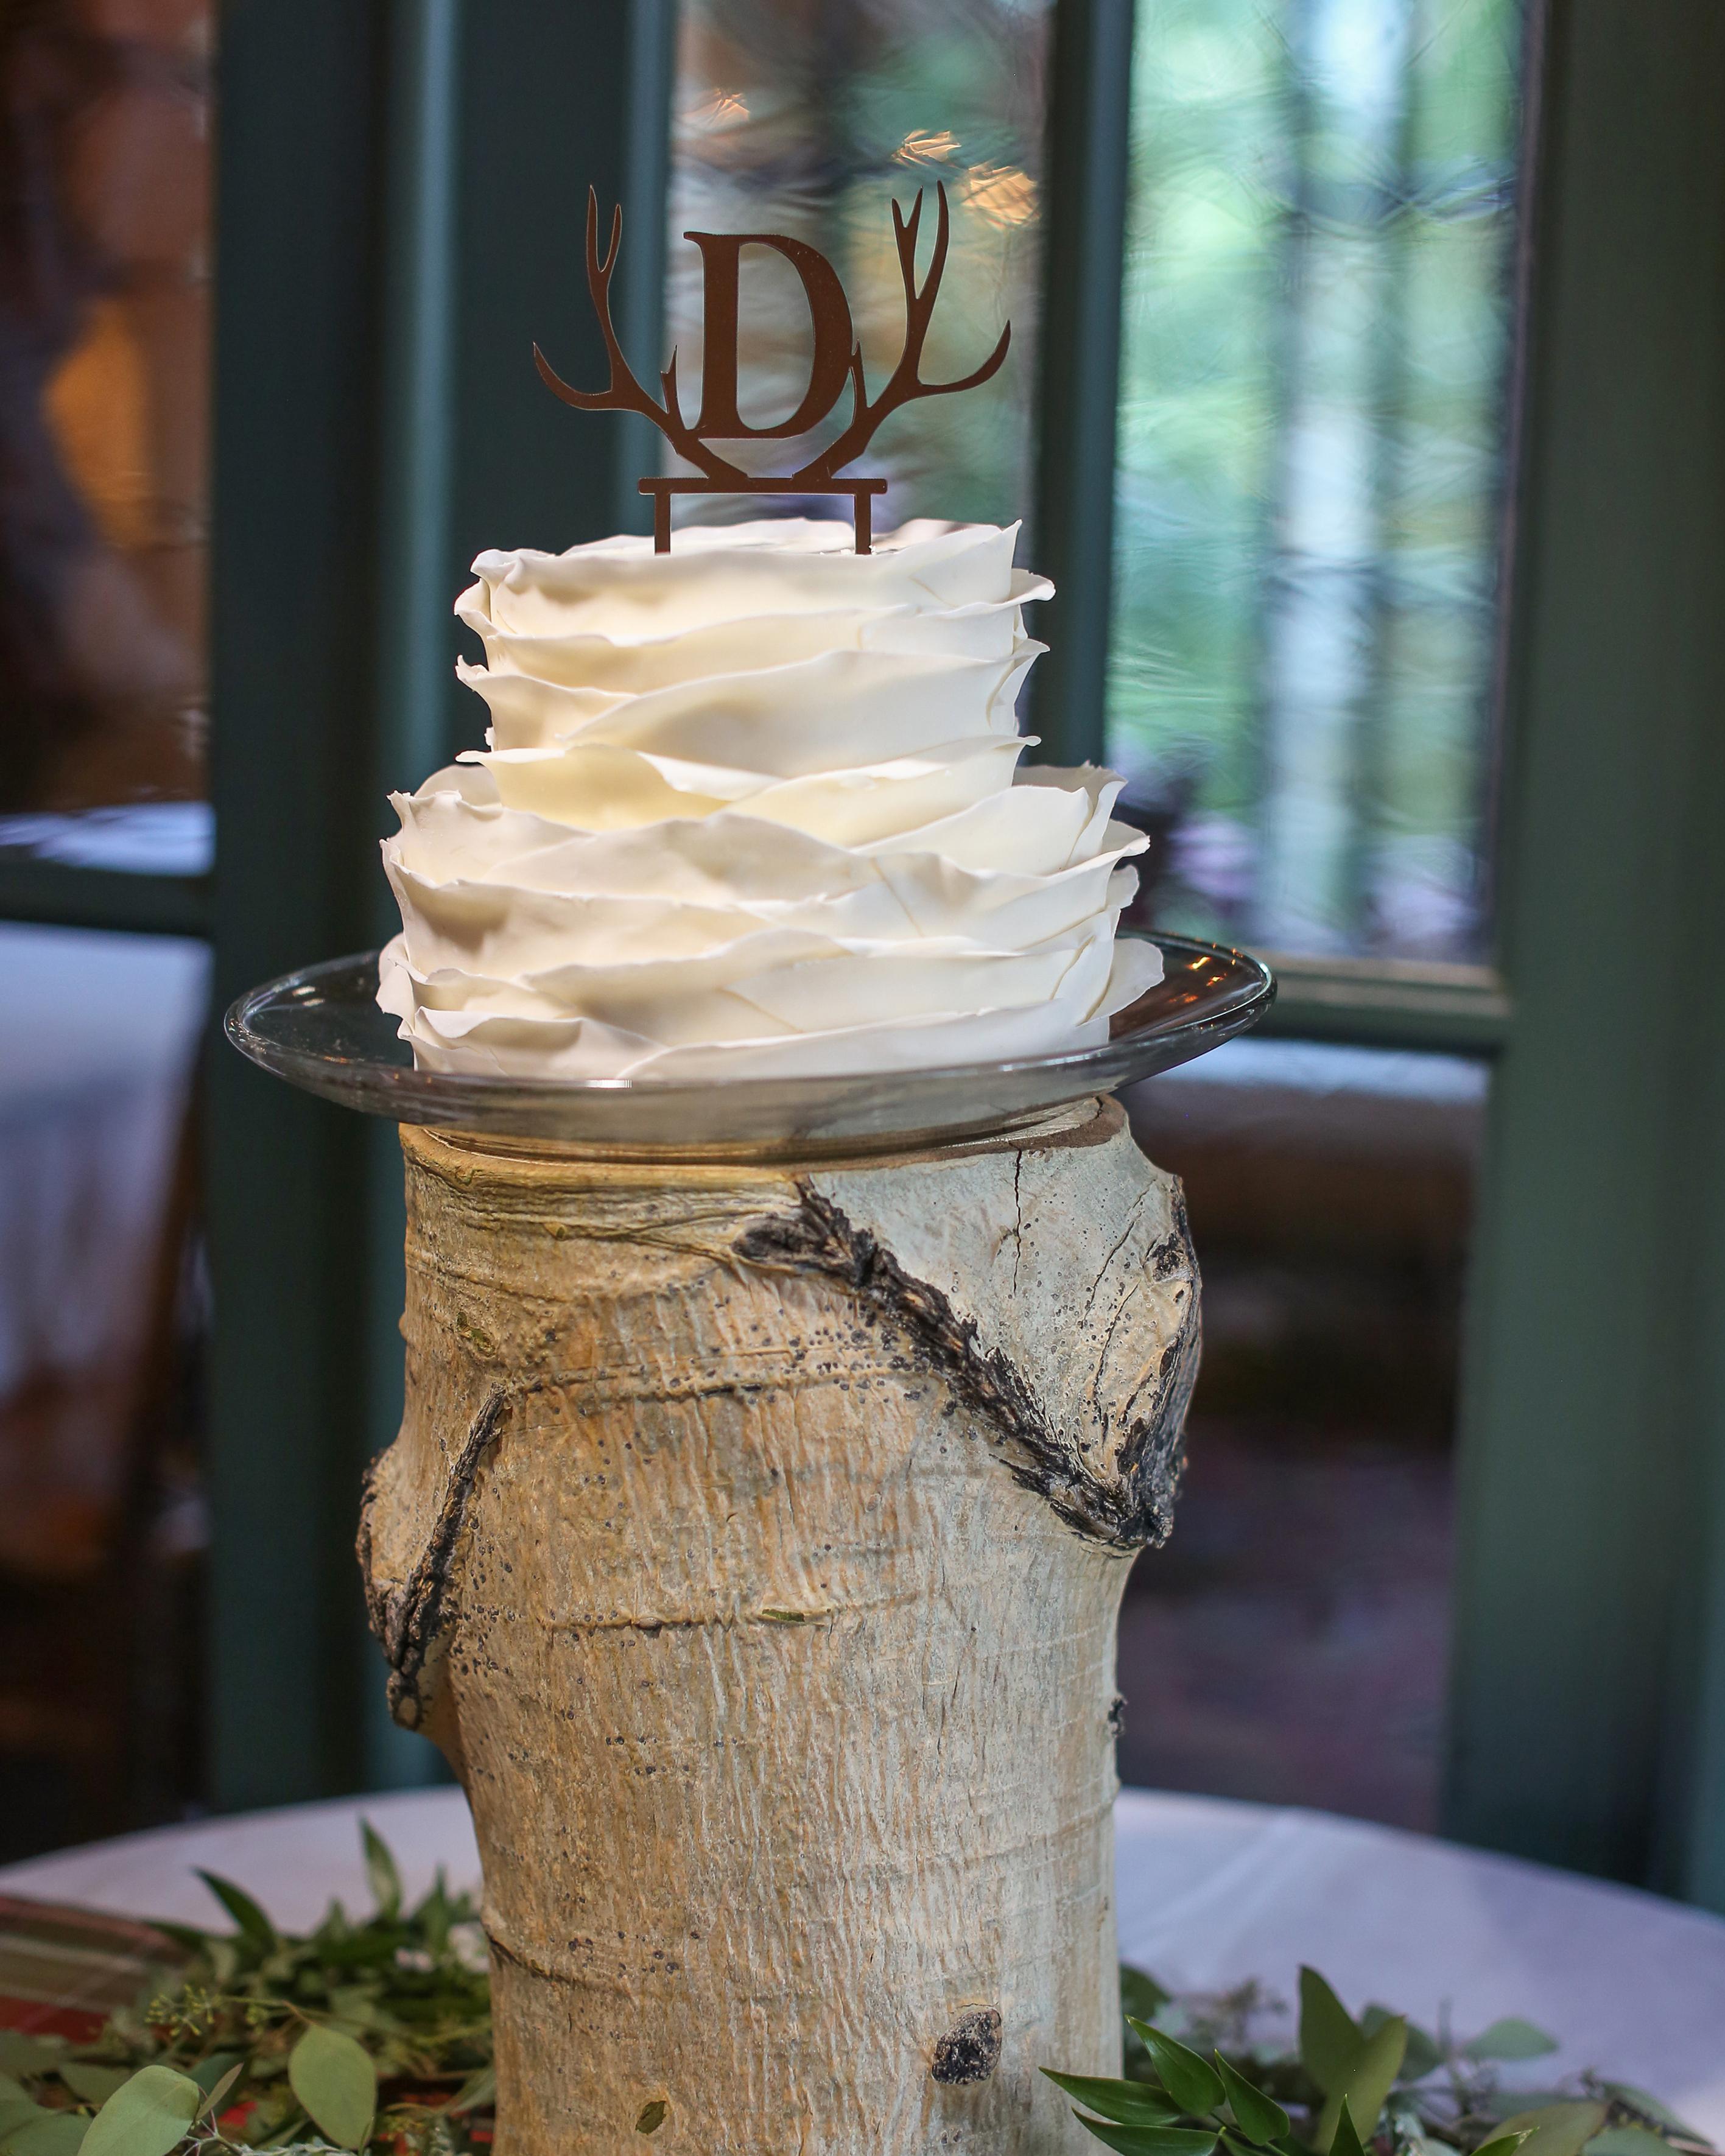 stacey-eric-wedding-cake-54-s111513-1014.jpg